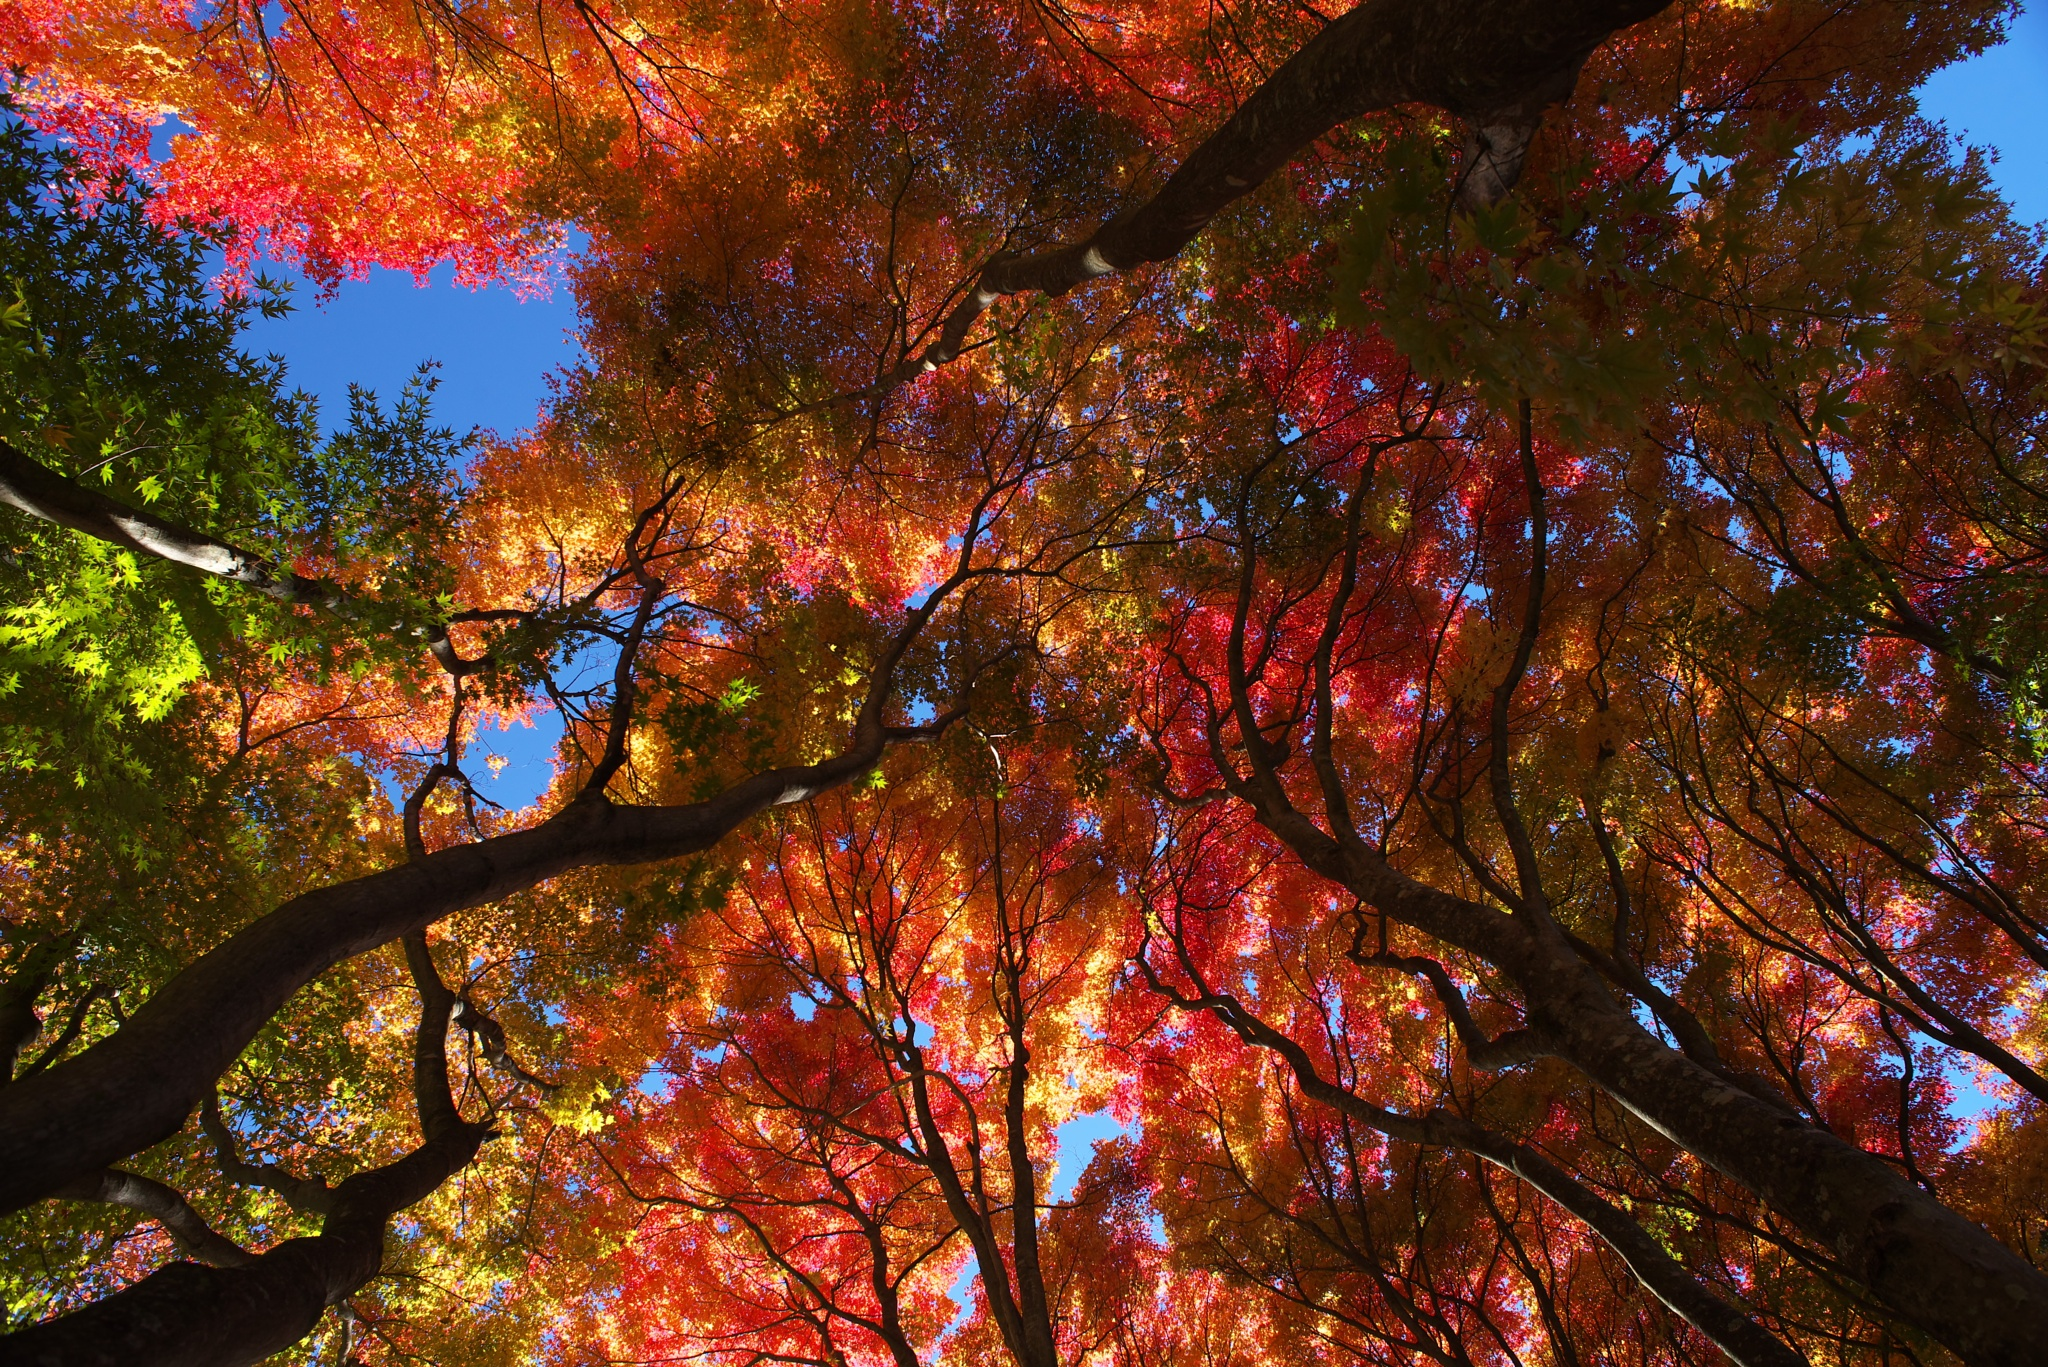 Autumn Colors by Masashi Itoh